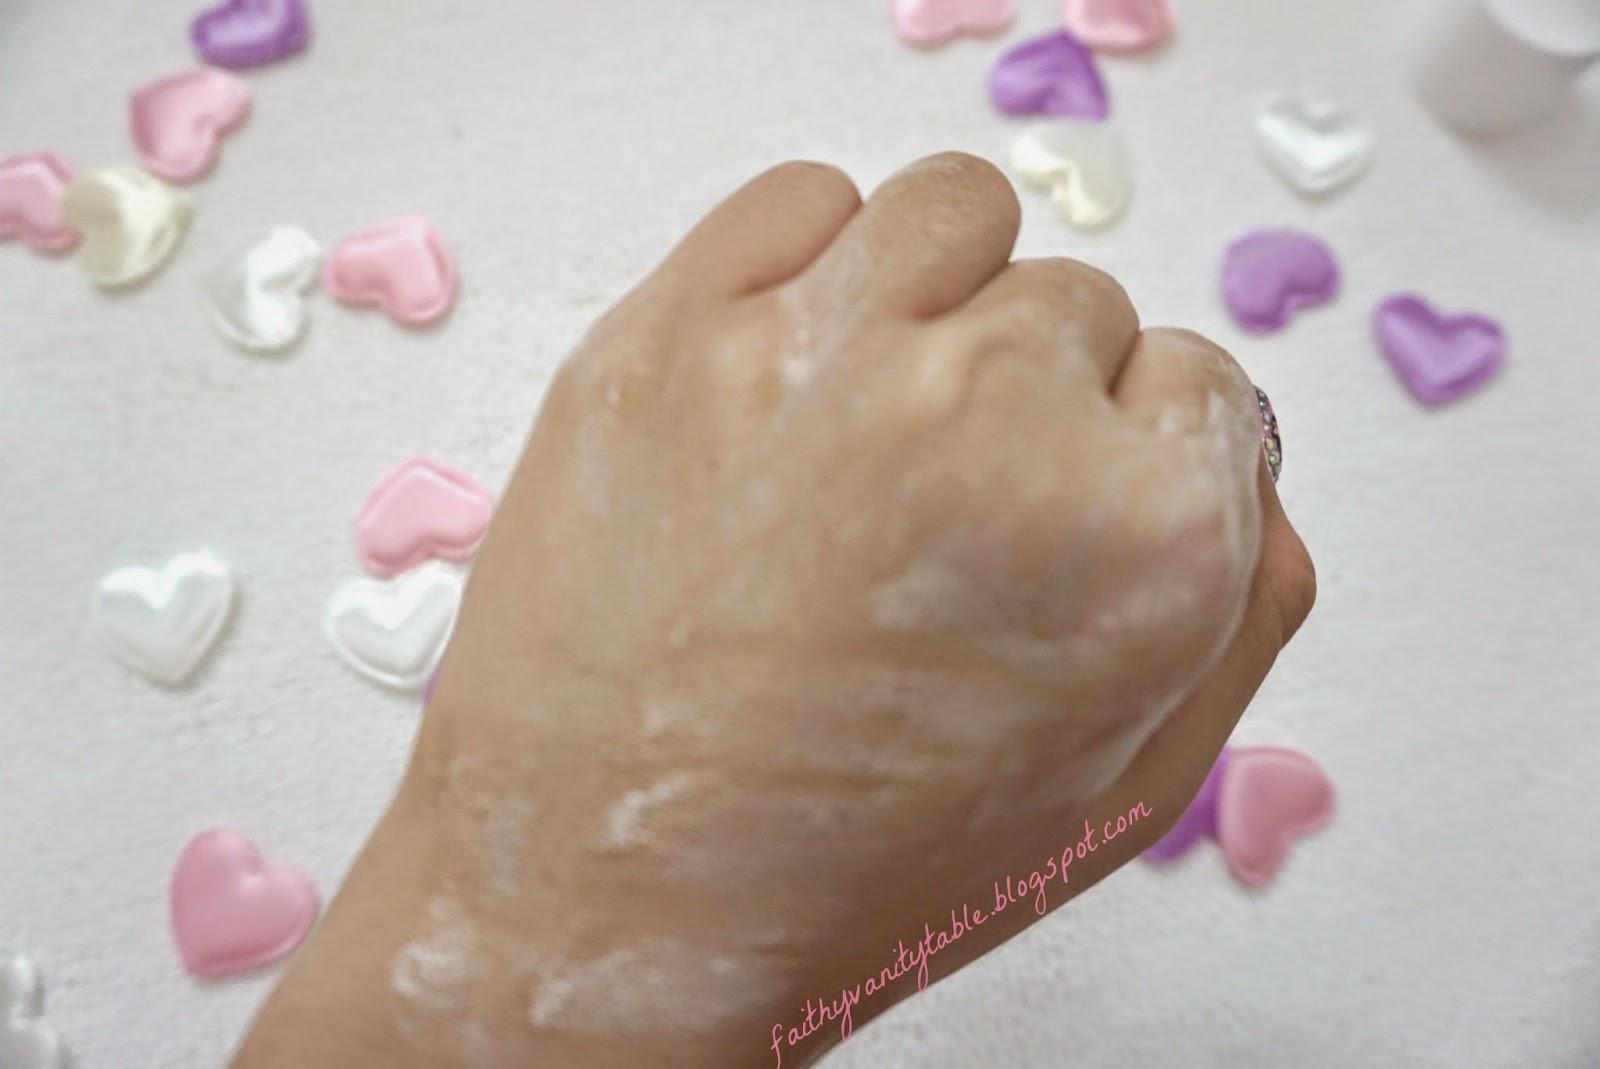 Iope Enzeme Powder Treatment Wash